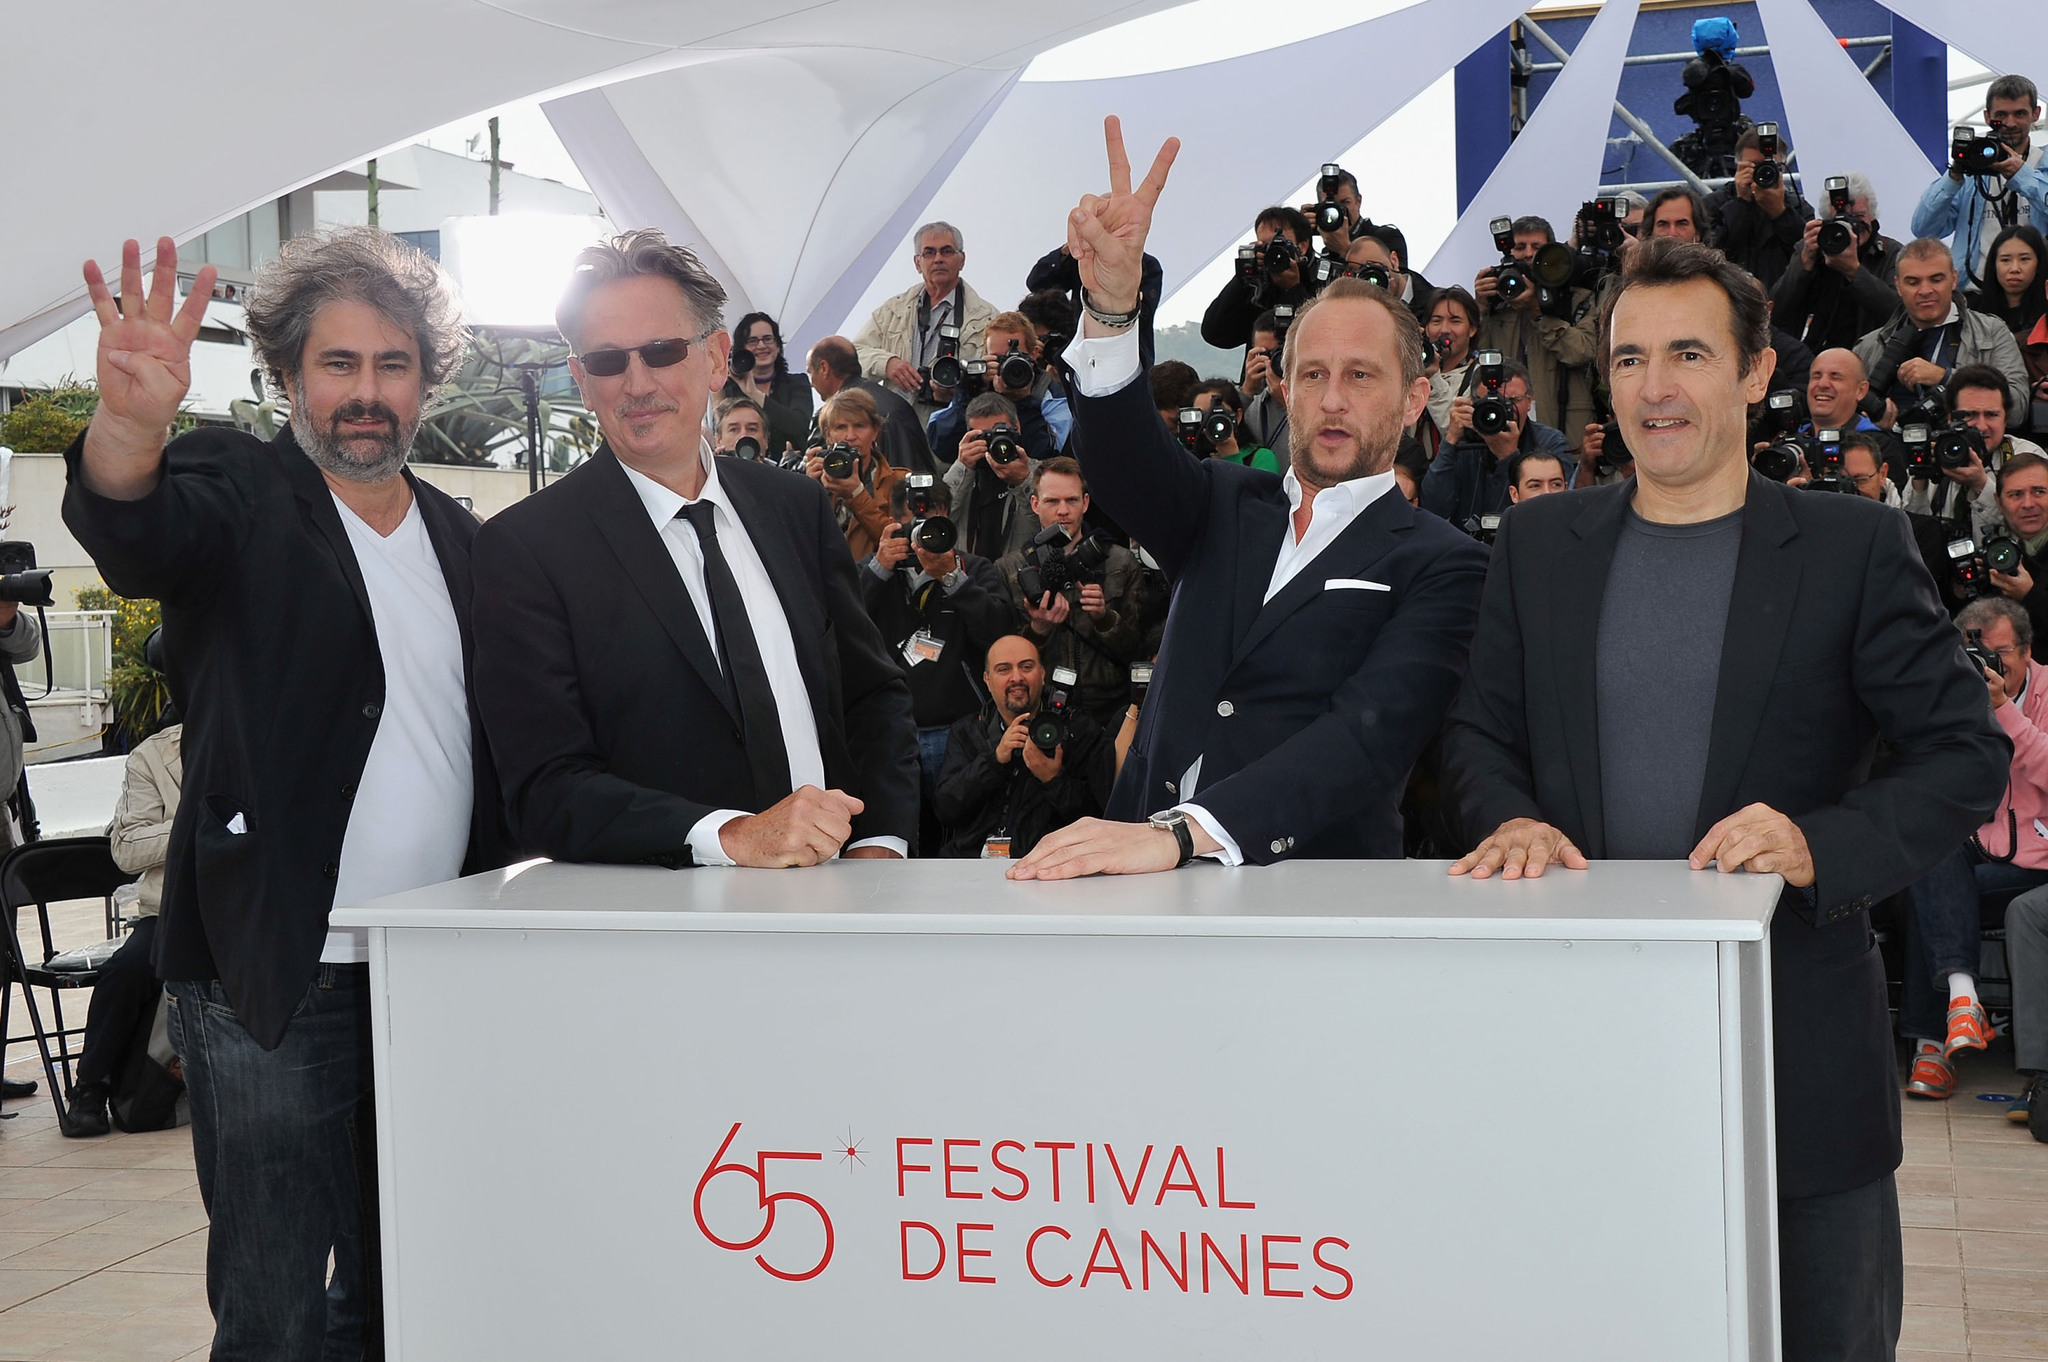 Benoît Delépine, Albert Dupontel, Benoît Poelvoorde, and Gustave Kervern at an event for Le grand soir (2012)